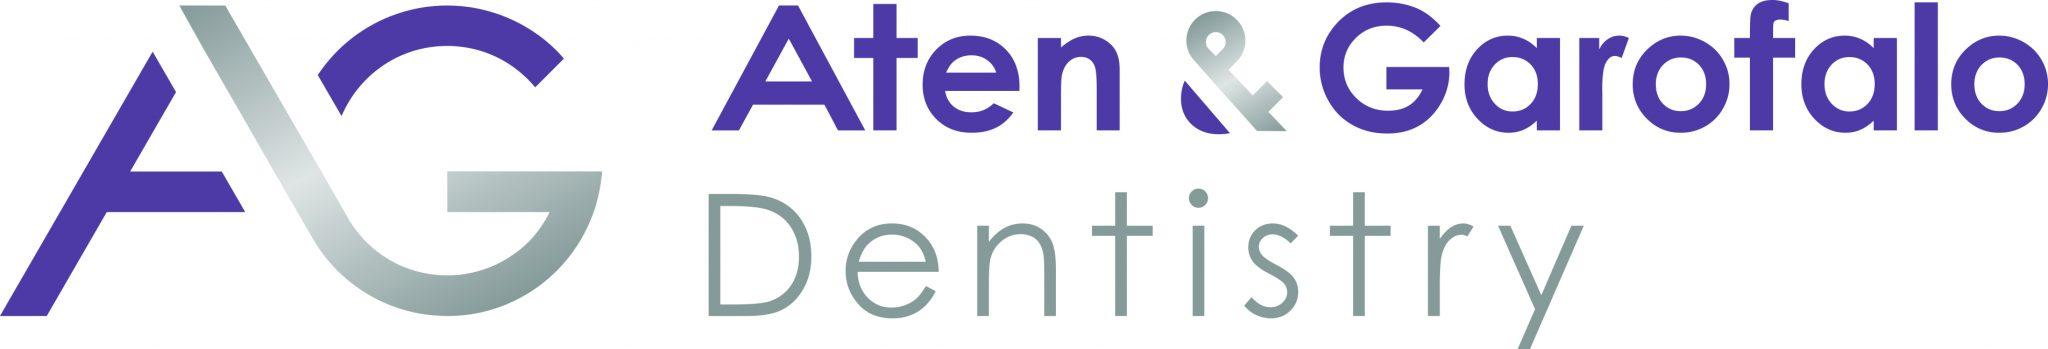 Aten & Garofalo Logo